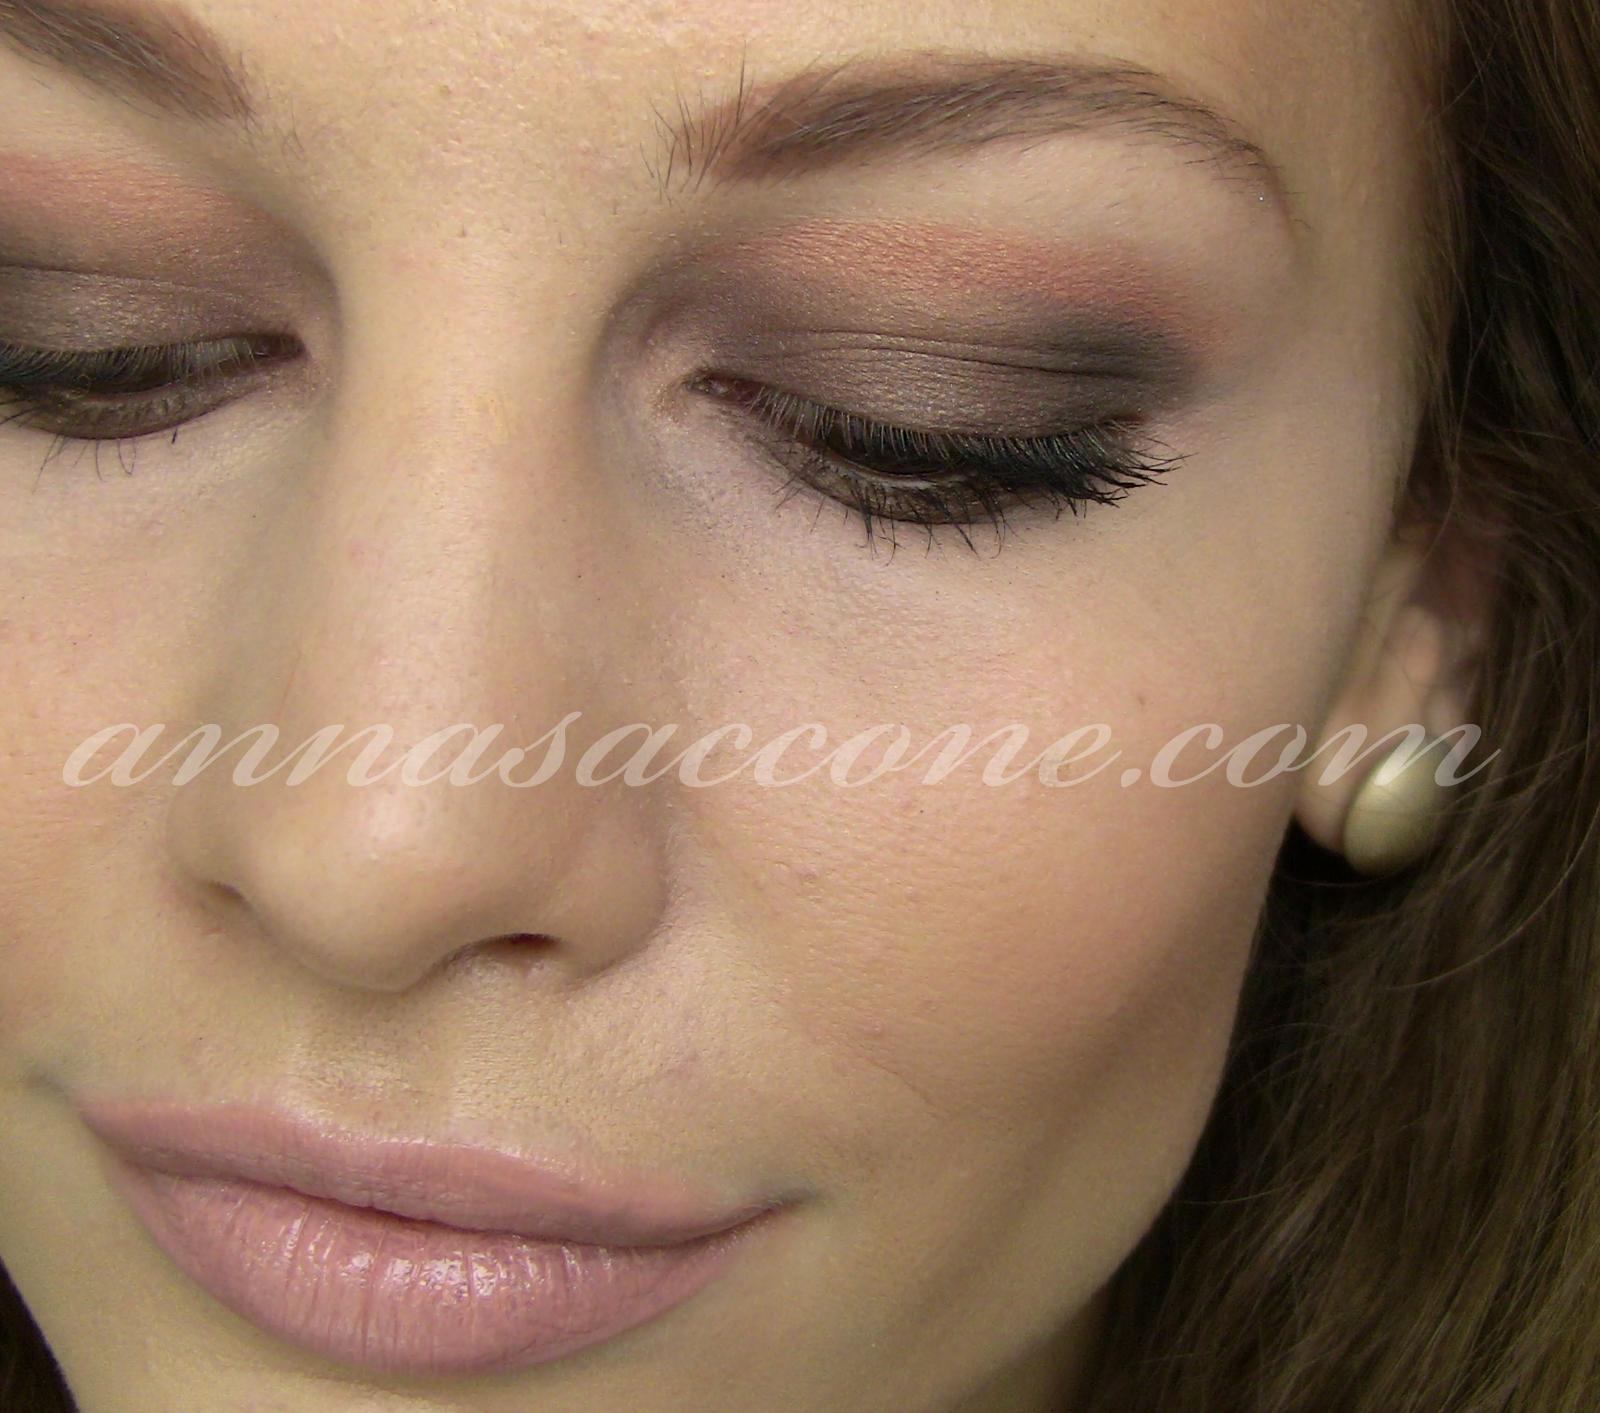 http://3.bp.blogspot.com/-u9PsEKIXCrs/TjxvqCH8NxI/AAAAAAAAH44/2RF-WeVxXGk/s1600/Mary-Kate-Olsen-Smokey-Eye.jpg